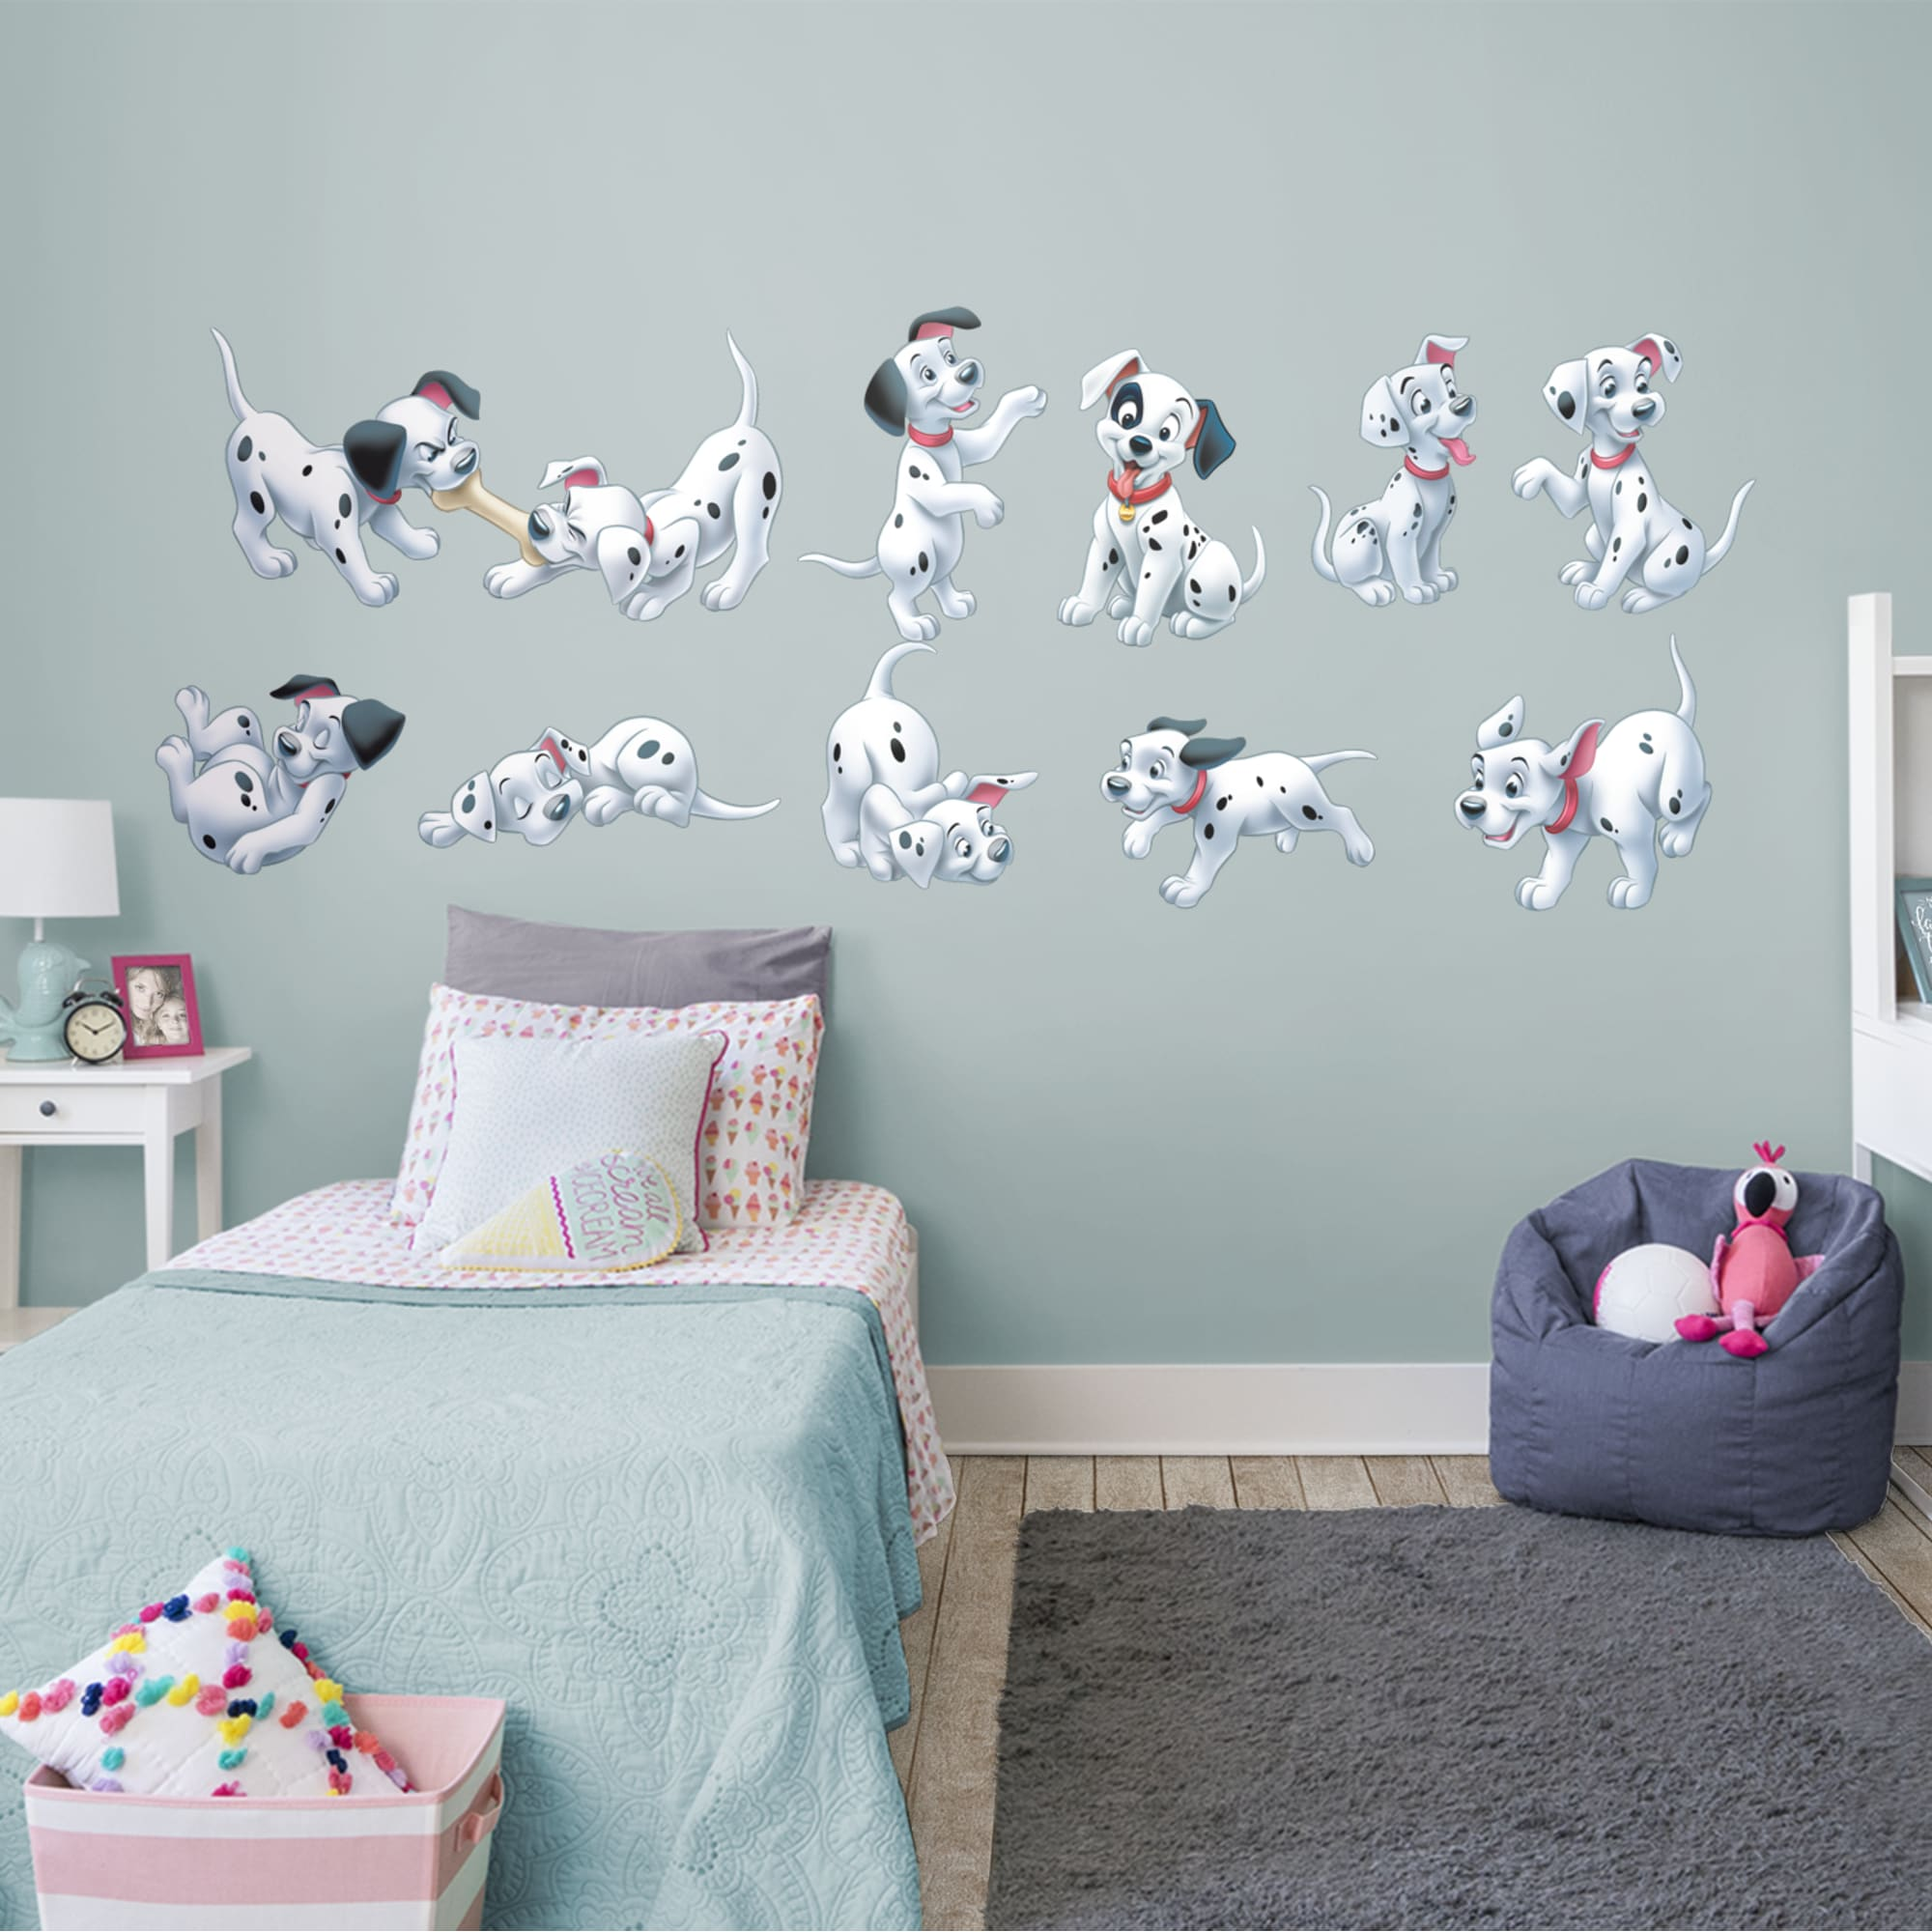 101 dalmatians wall decal ae1159